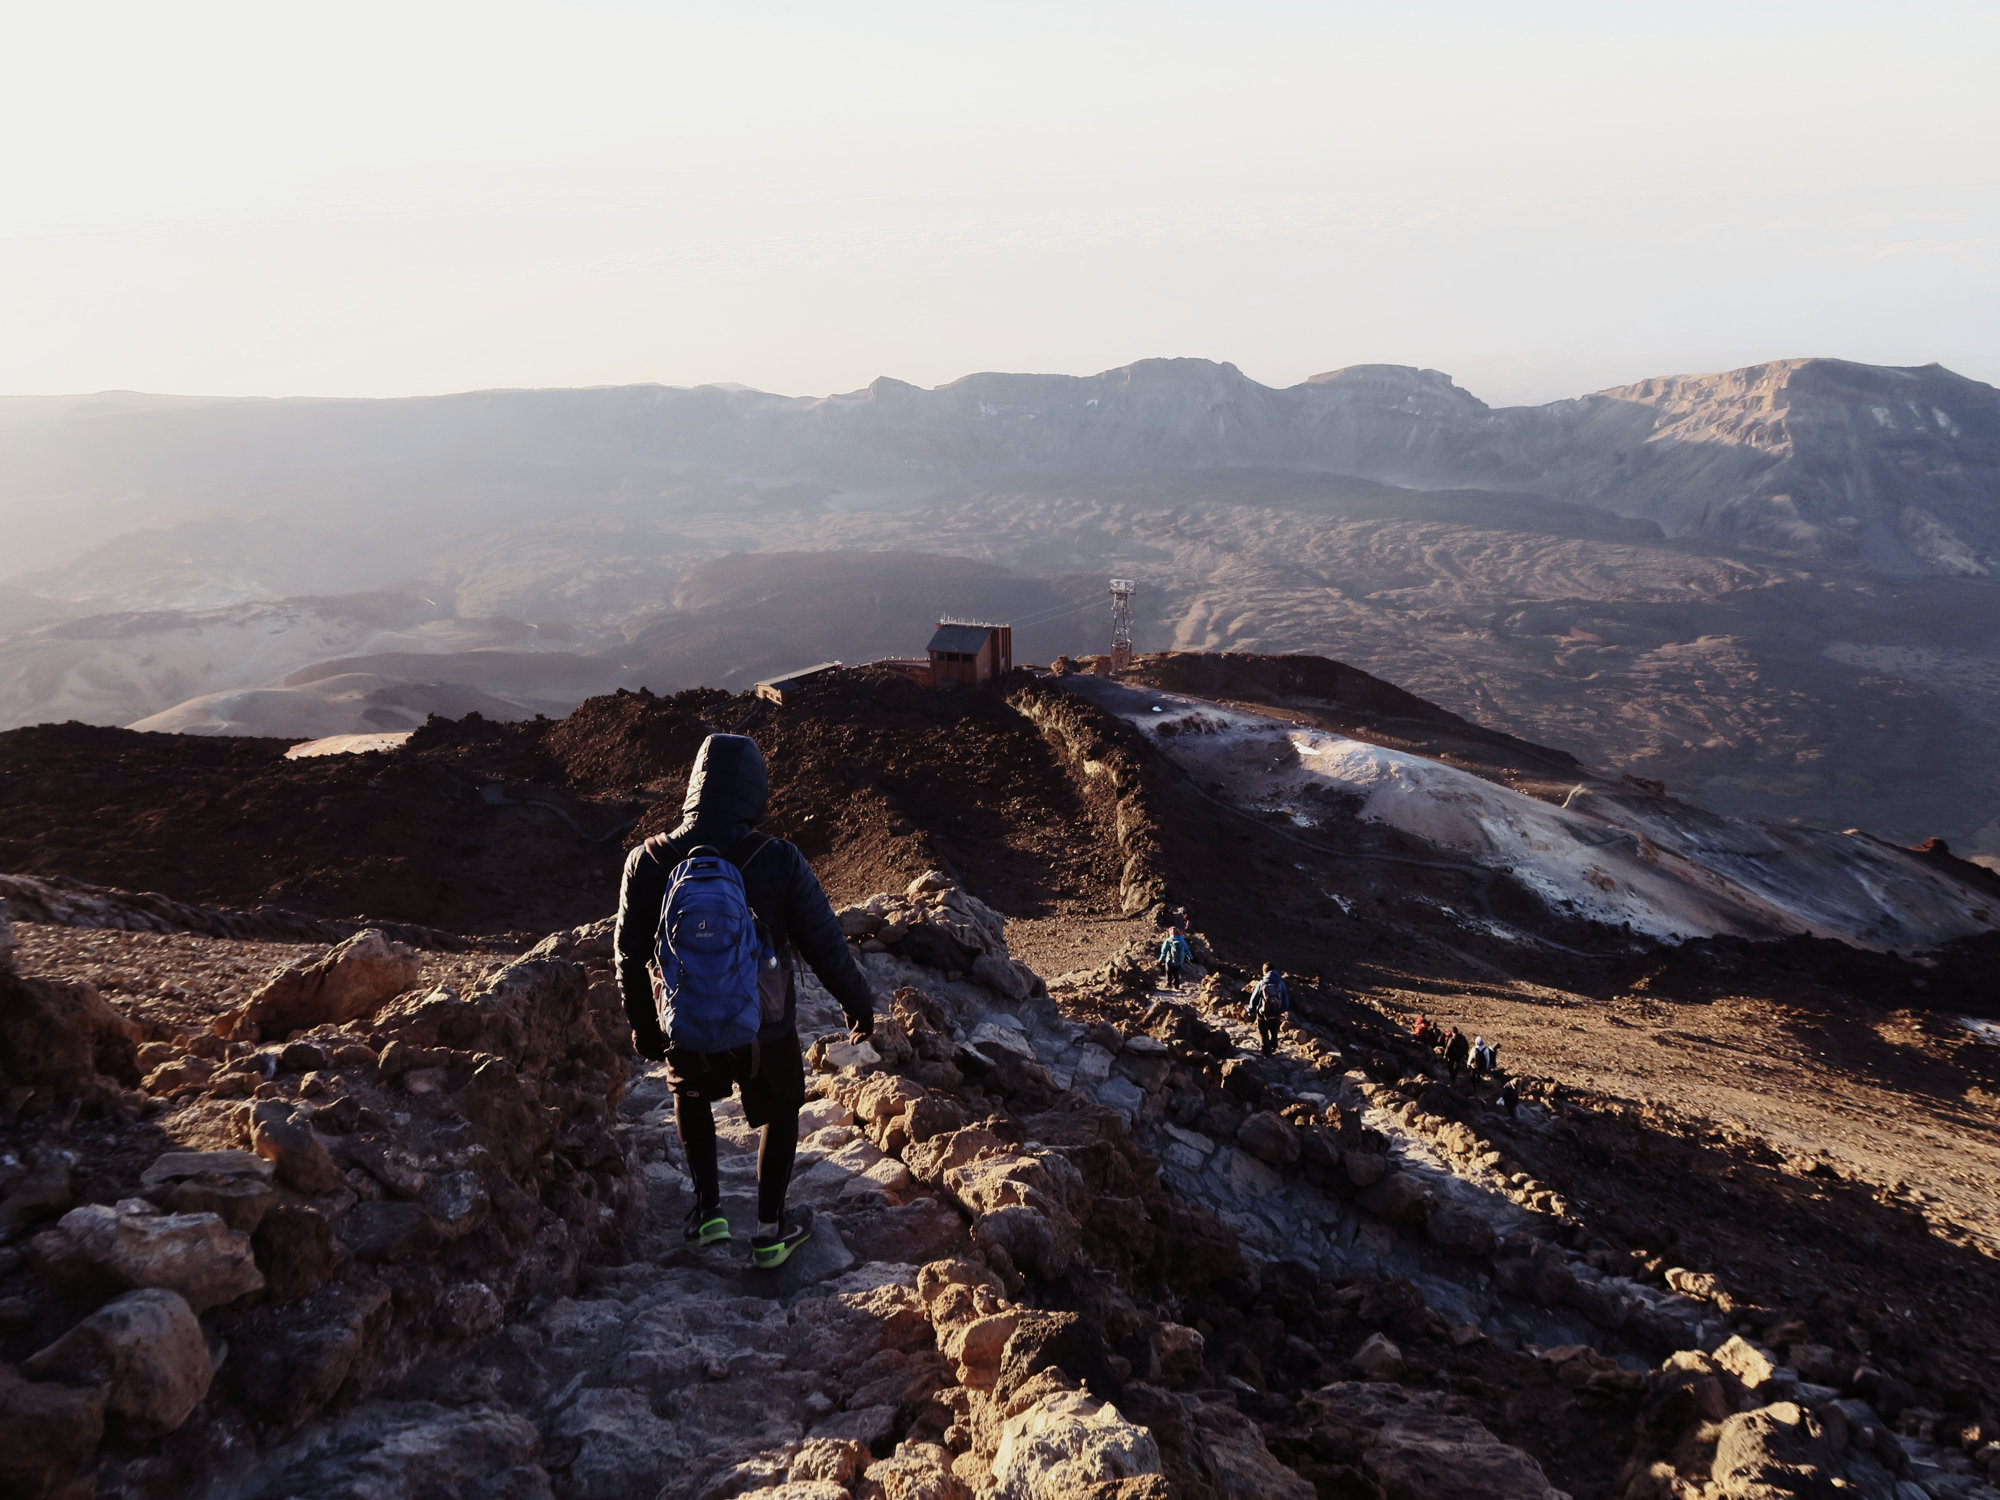 Wandern zur Seilbahn des Teide